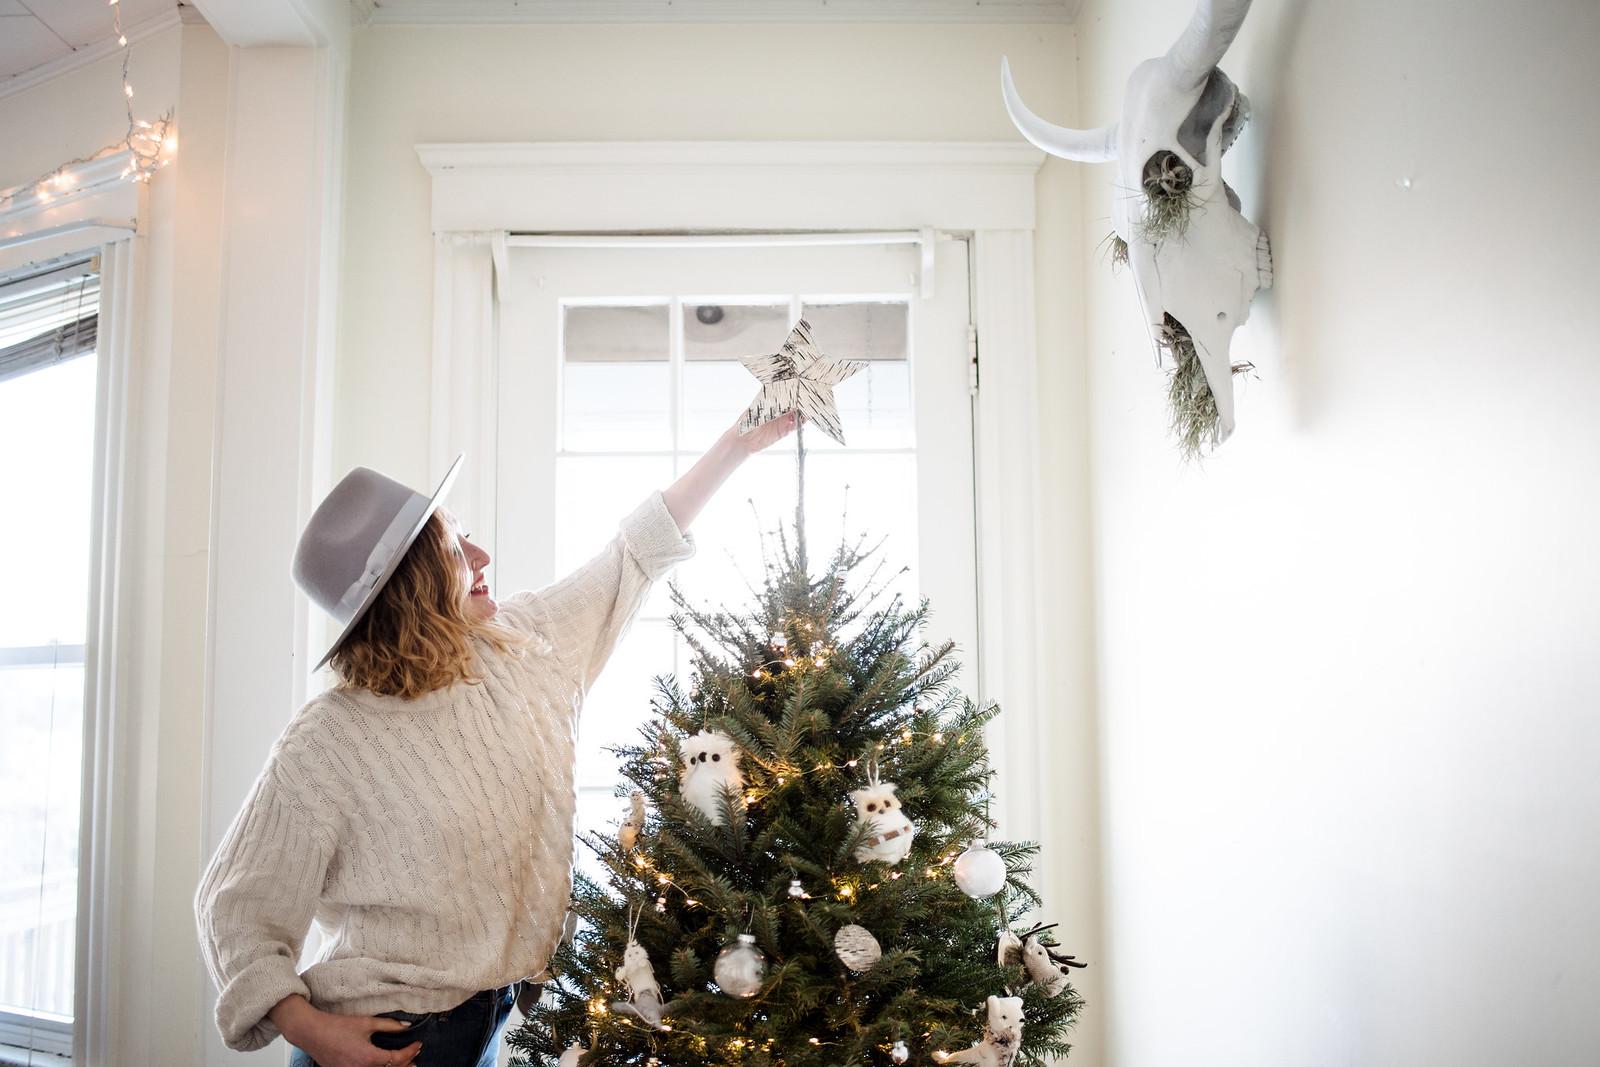 Top The Tree on juliettelaura.blogspot.com